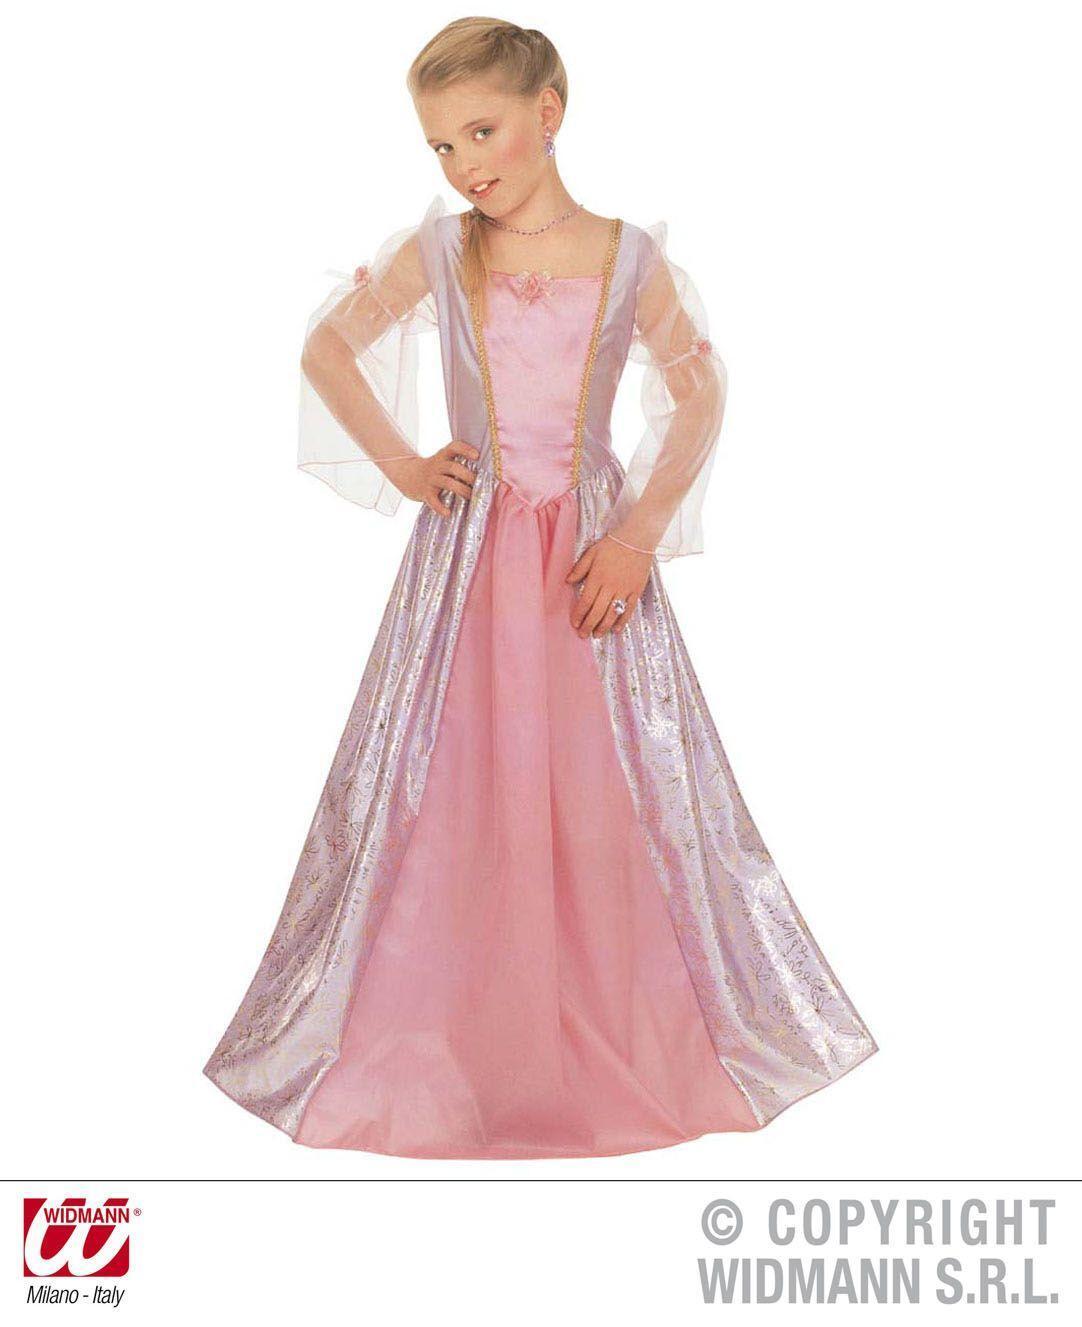 Karneval Mädchen Kostüm Prinzessin Silvia - Faschingskram